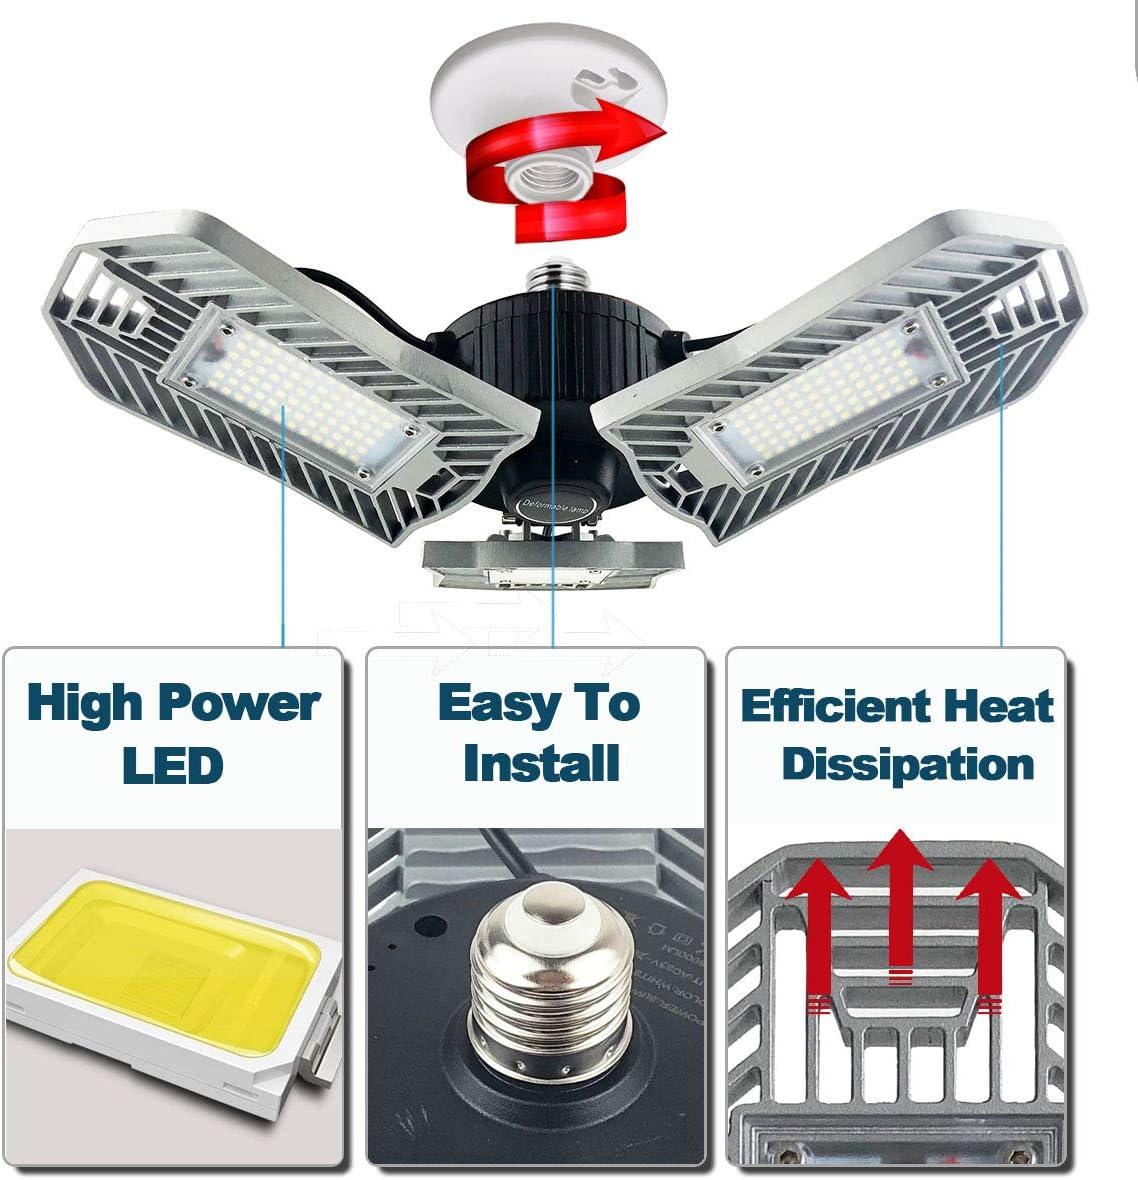 8er Set LED Ceiling Bath Lights Garage Daylight Wet Room Tube Heater